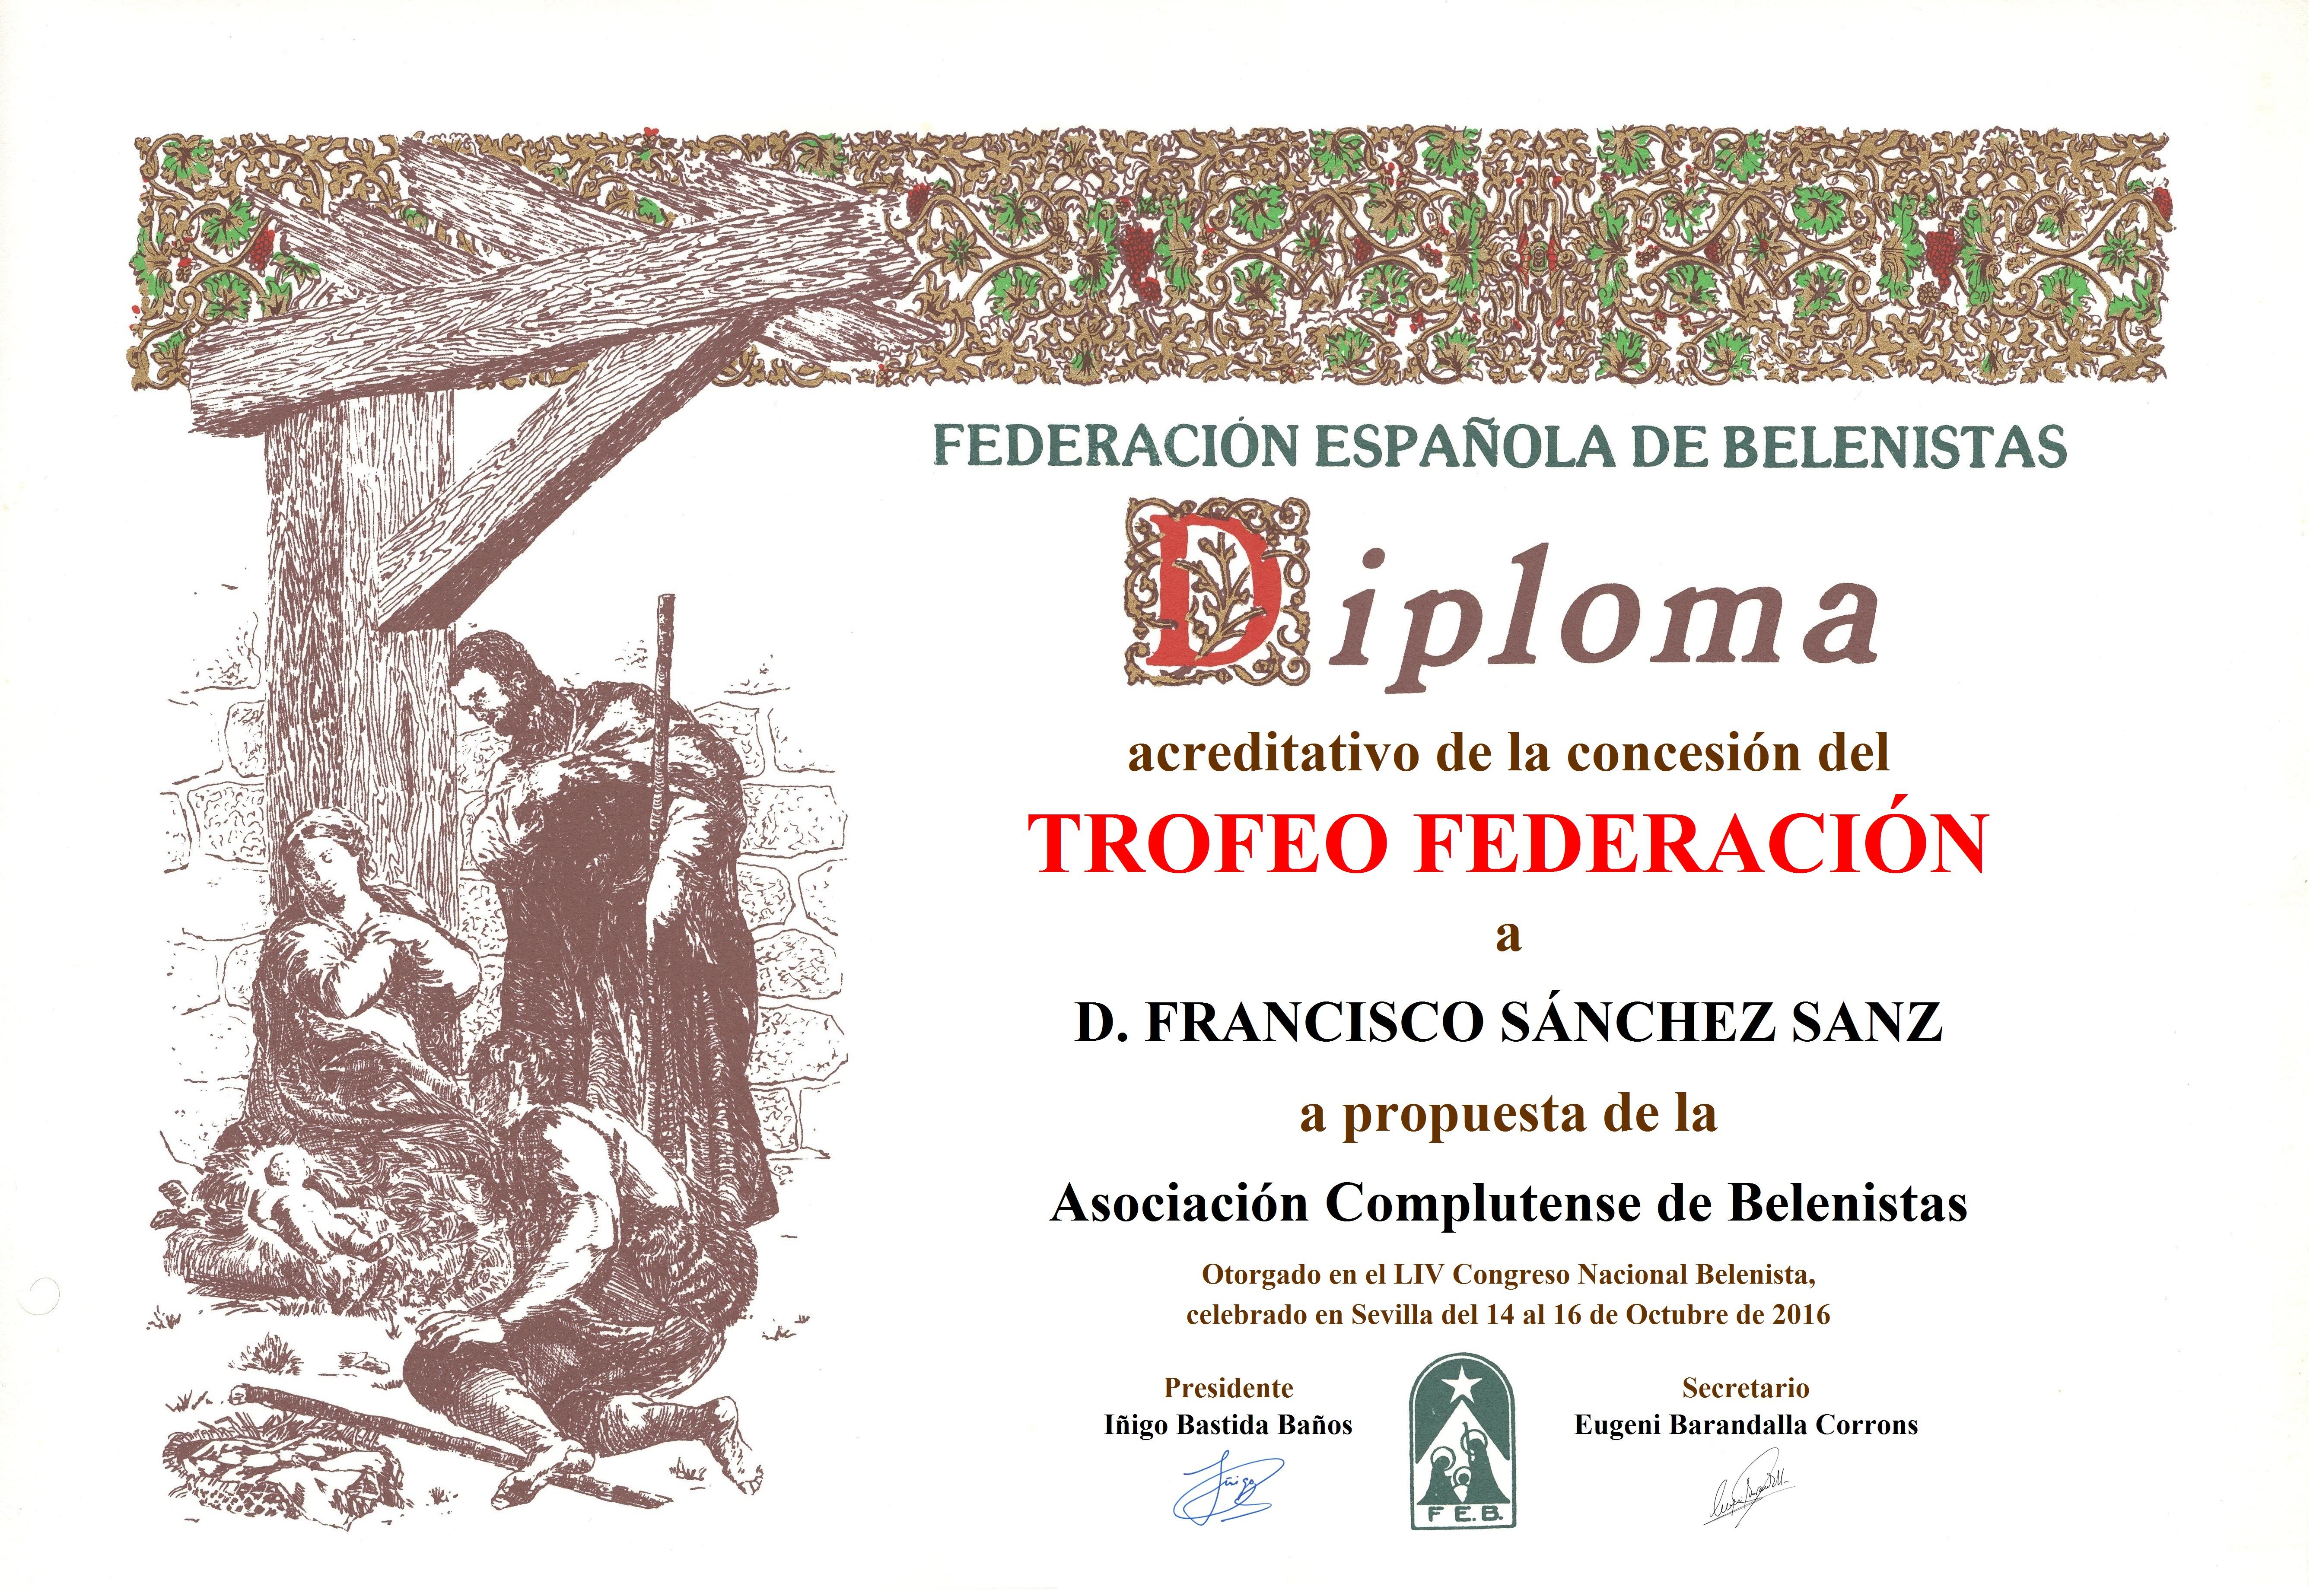 Francisco Sánchez Sanz - Diploma Trofeo FEB 2016